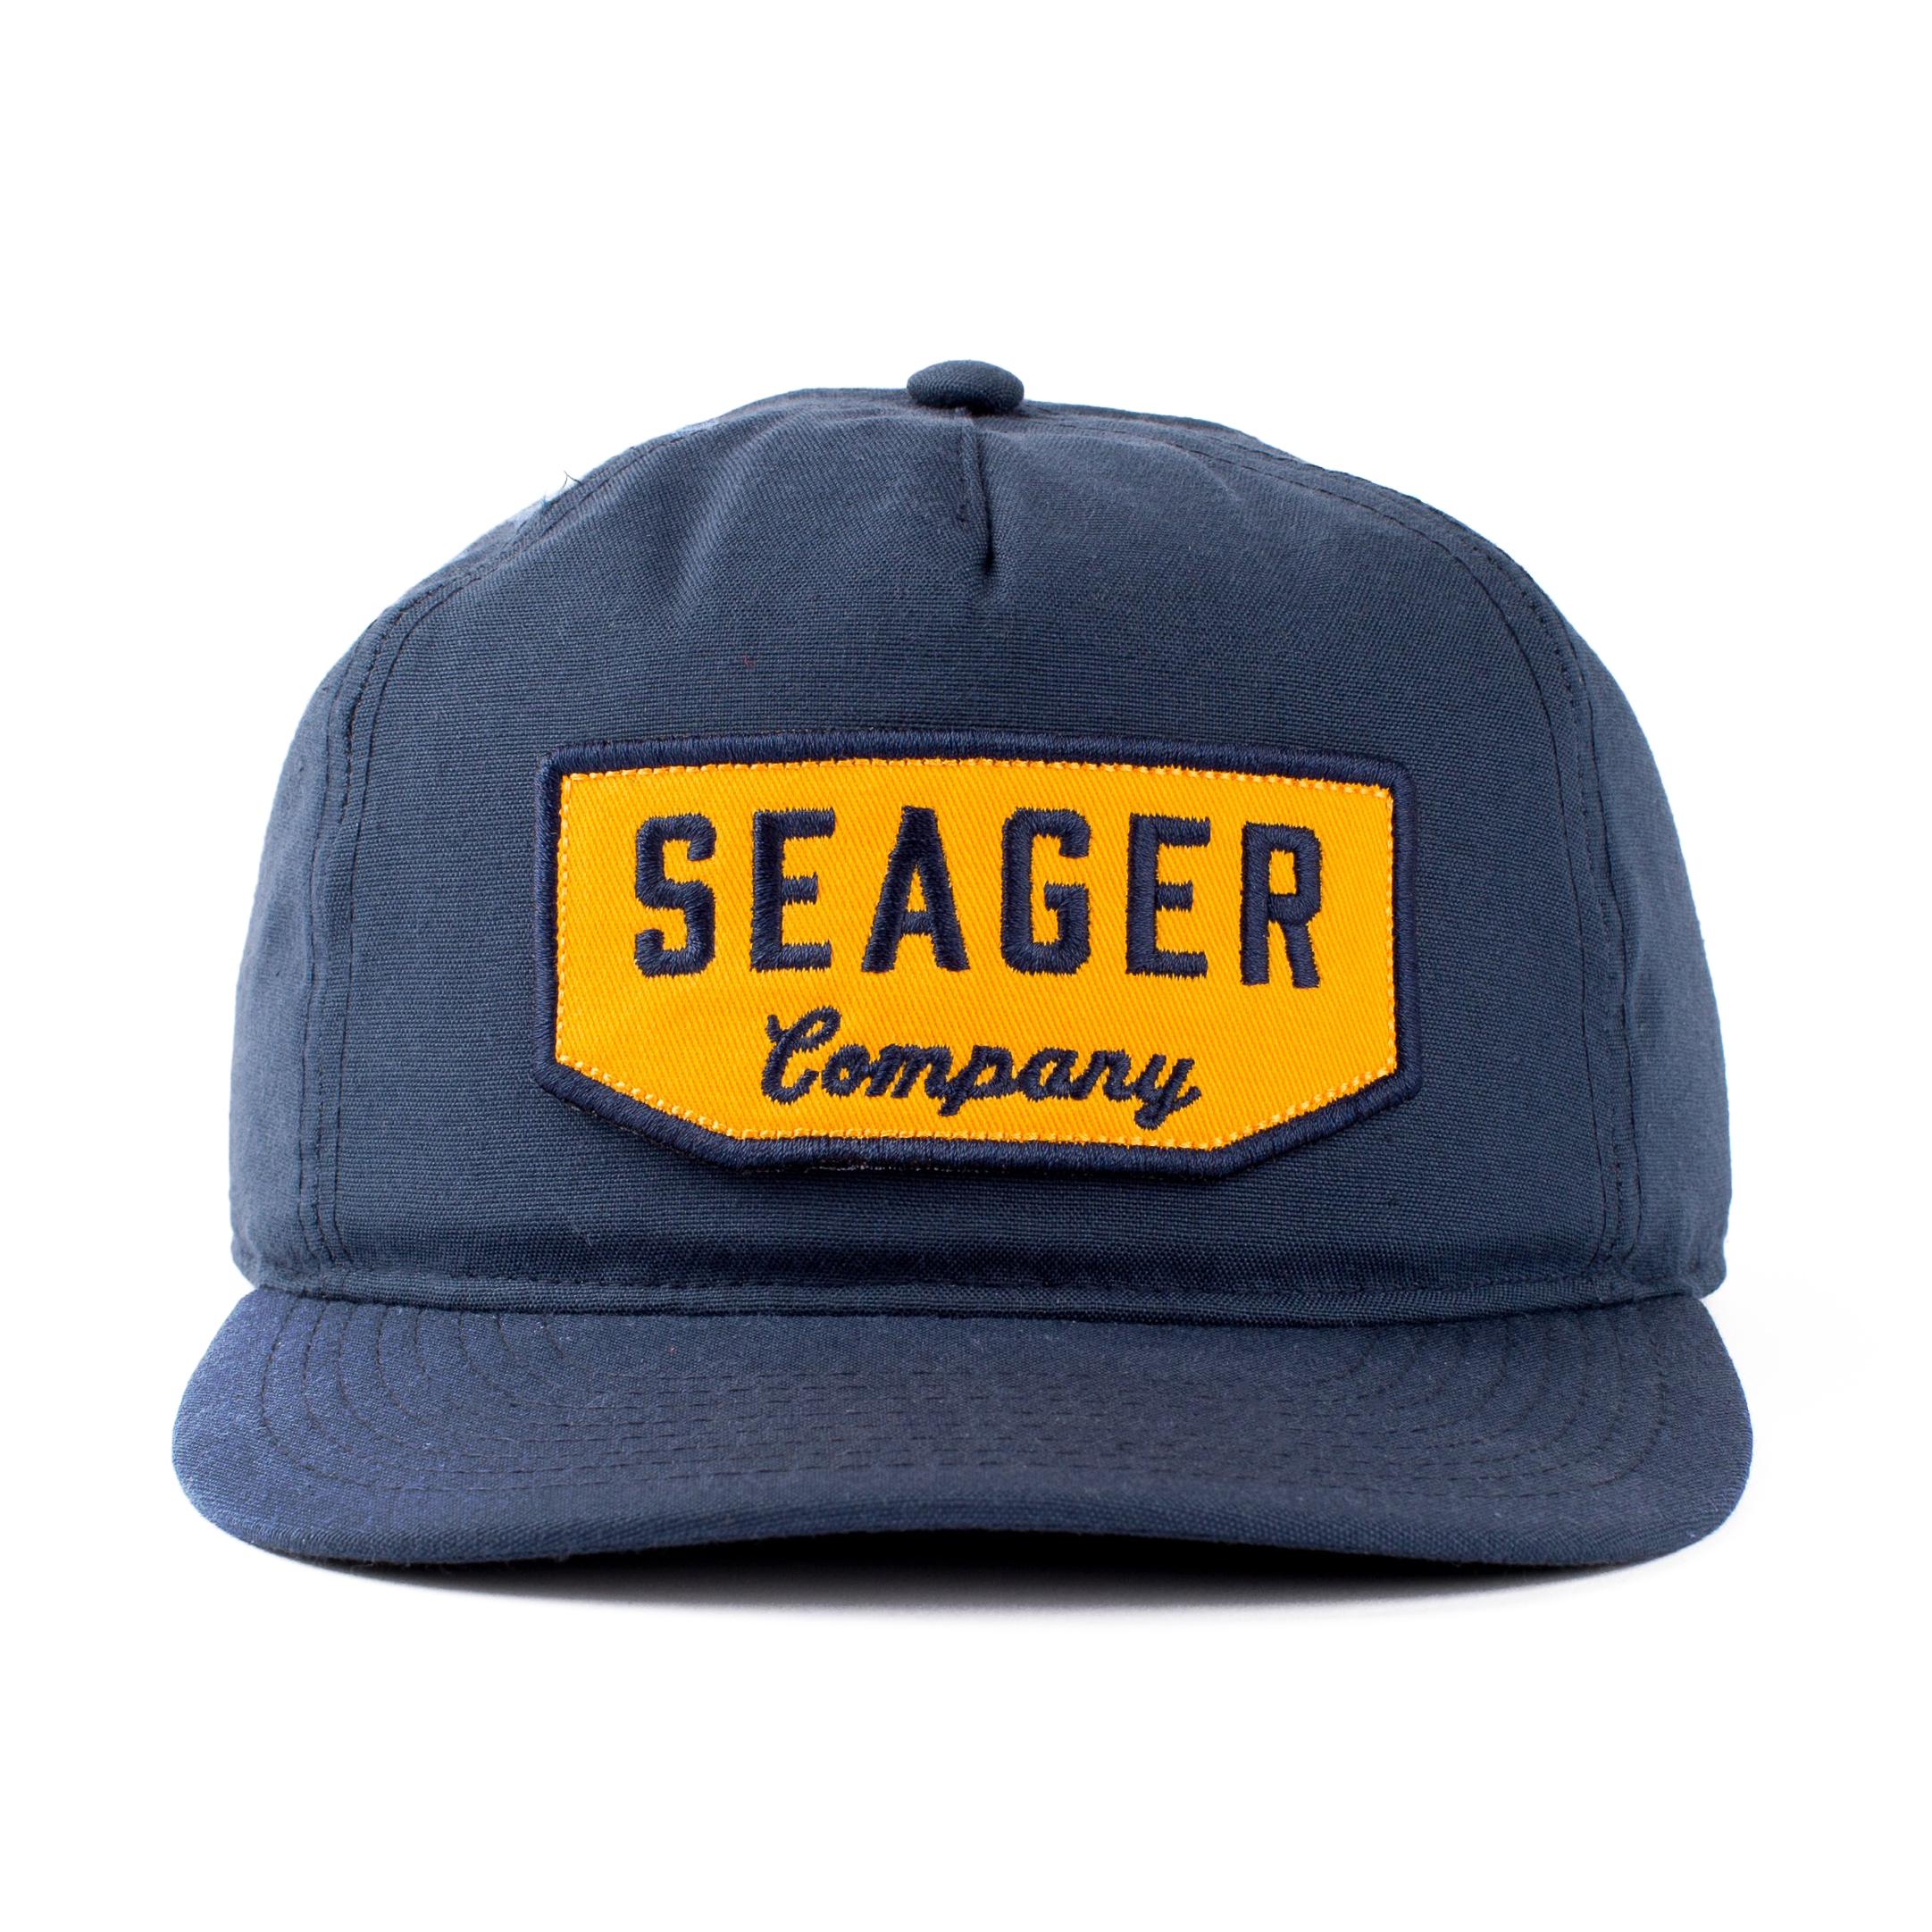 2xgepi7gqg seager co wilson snapback 0 original.jpg?ixlib=rails 2.1